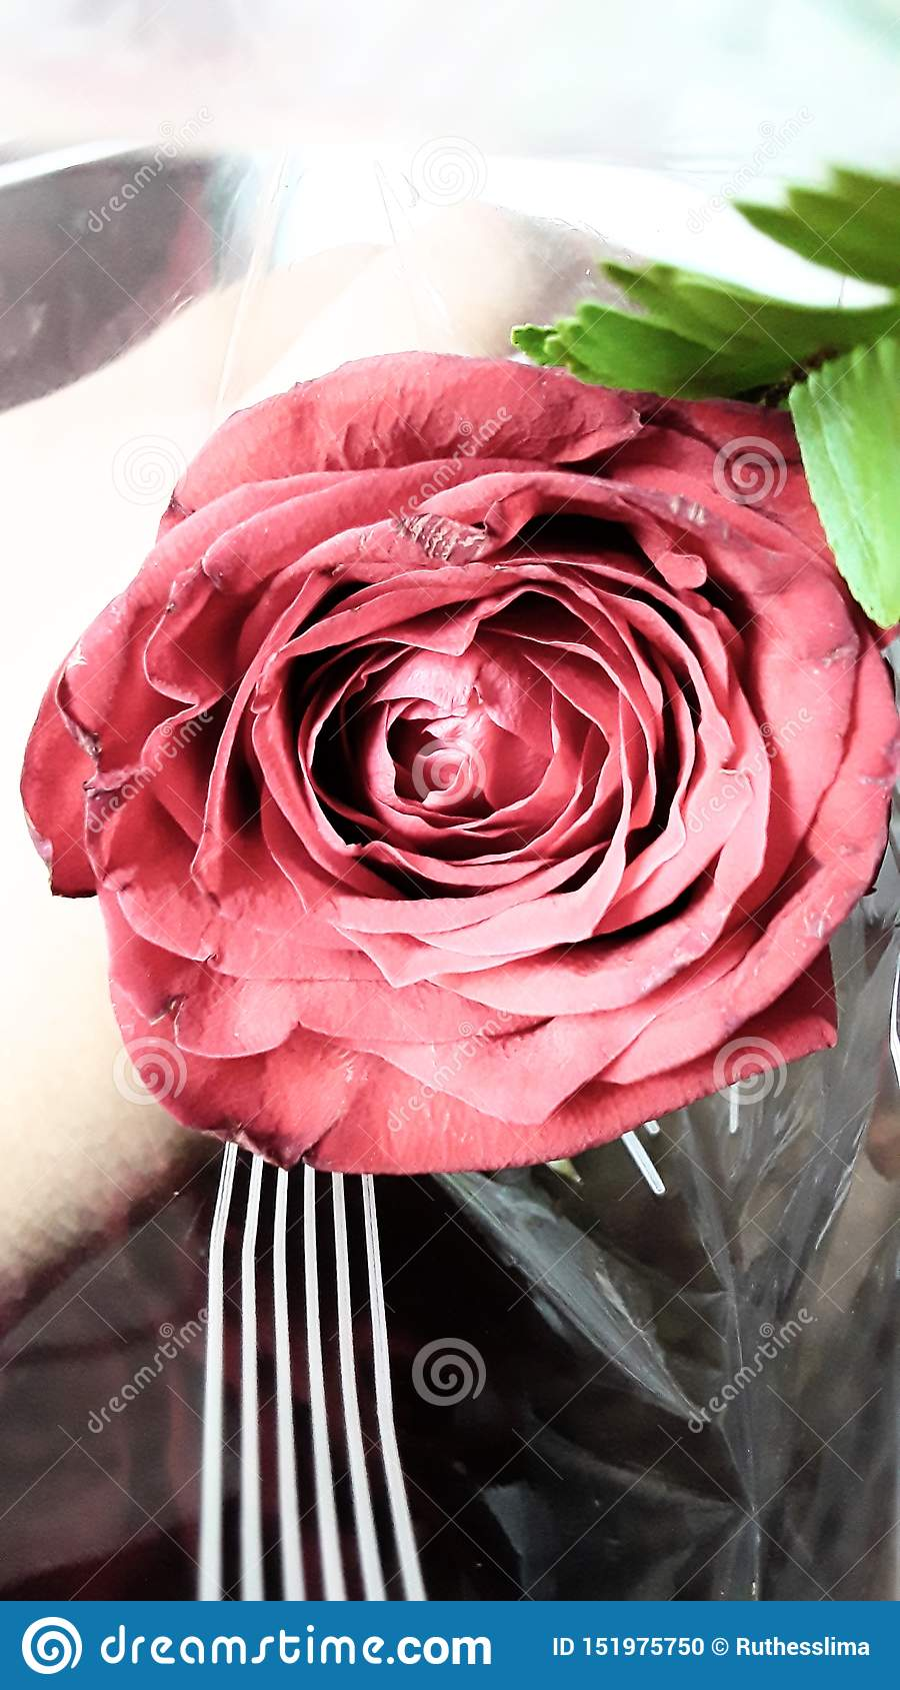 A rose for aum rose